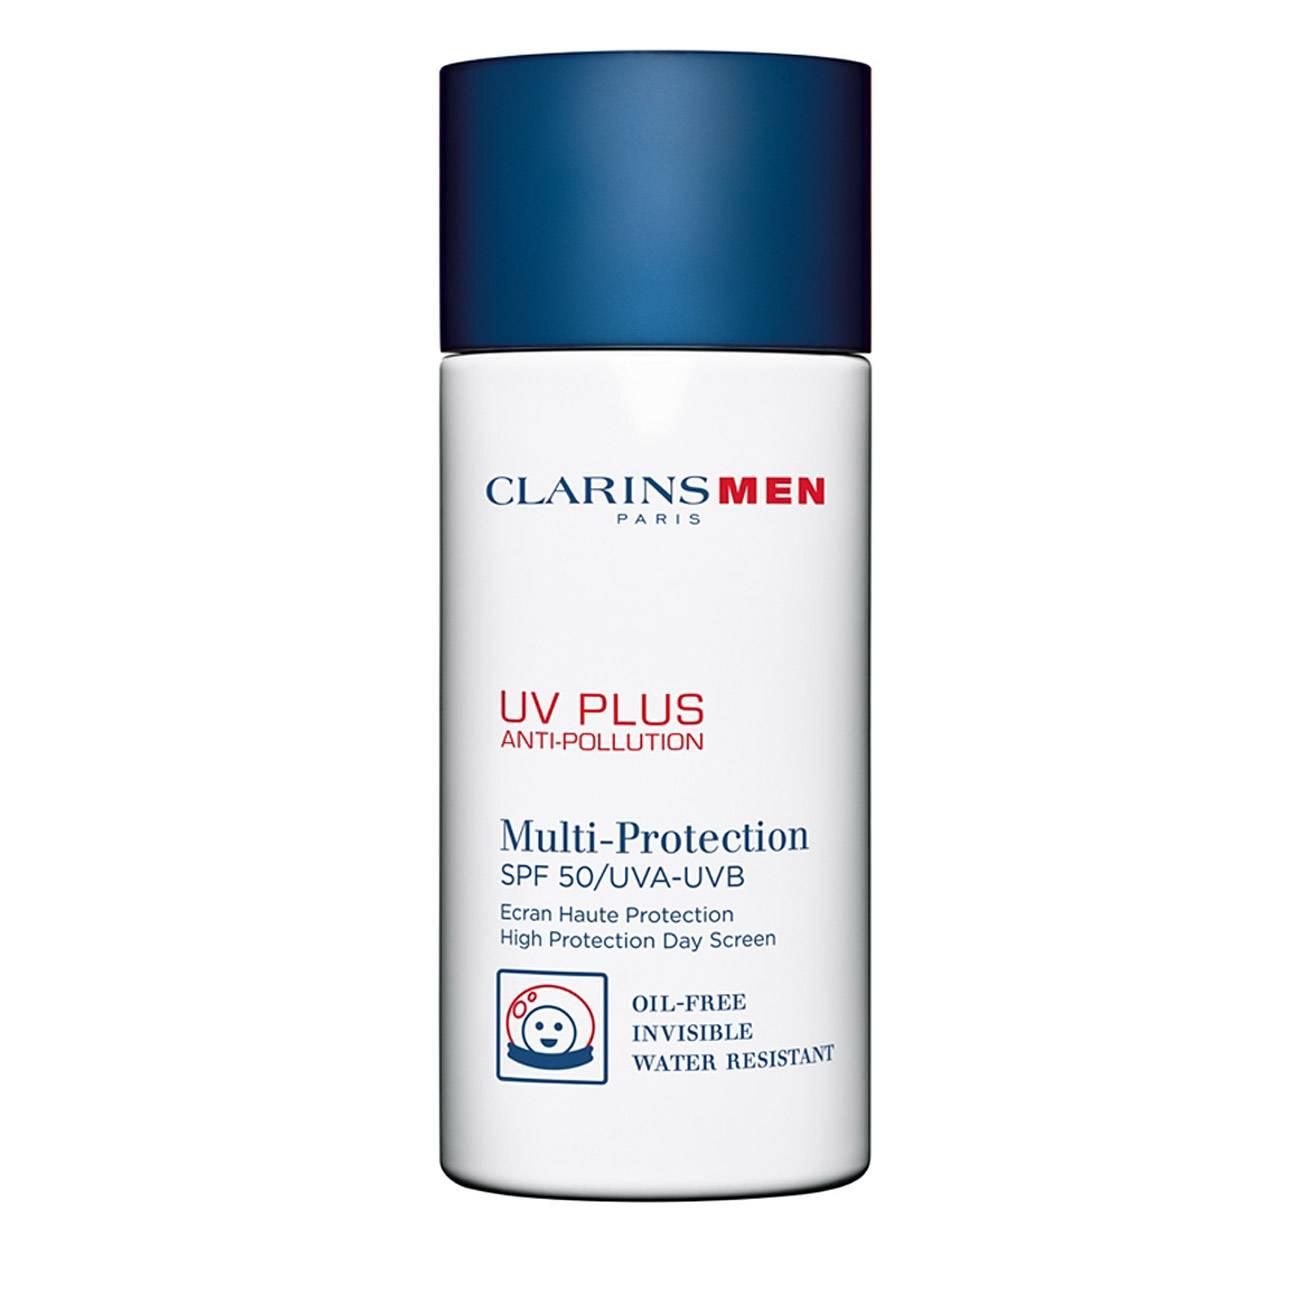 MEN CARE UV PLUS MULTI PROTECTION 50 Ml poza